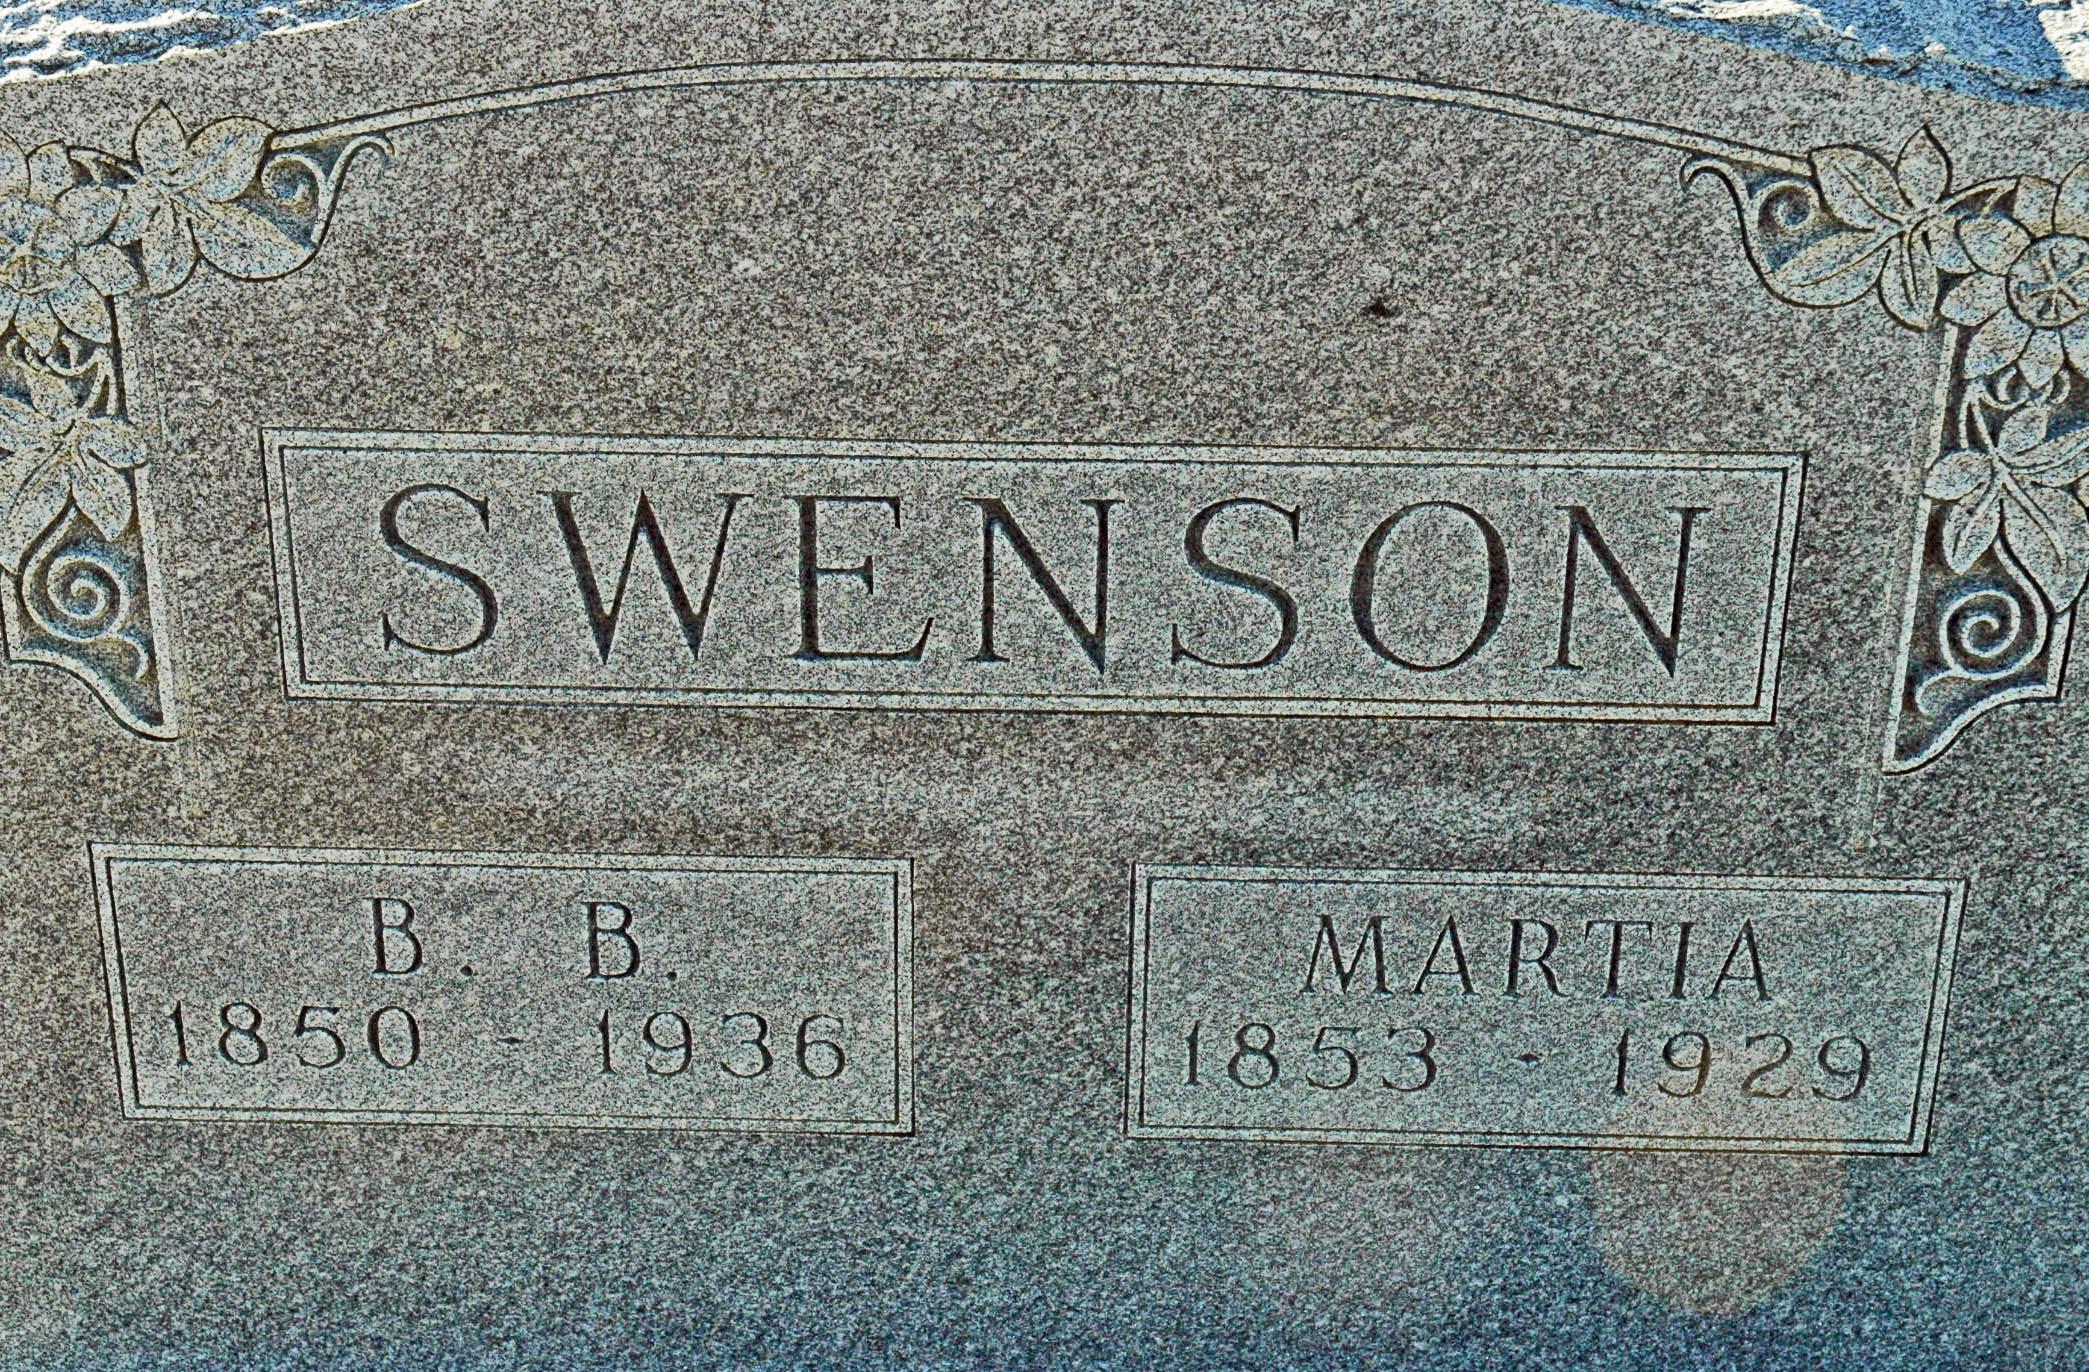 Bernt B Swenson